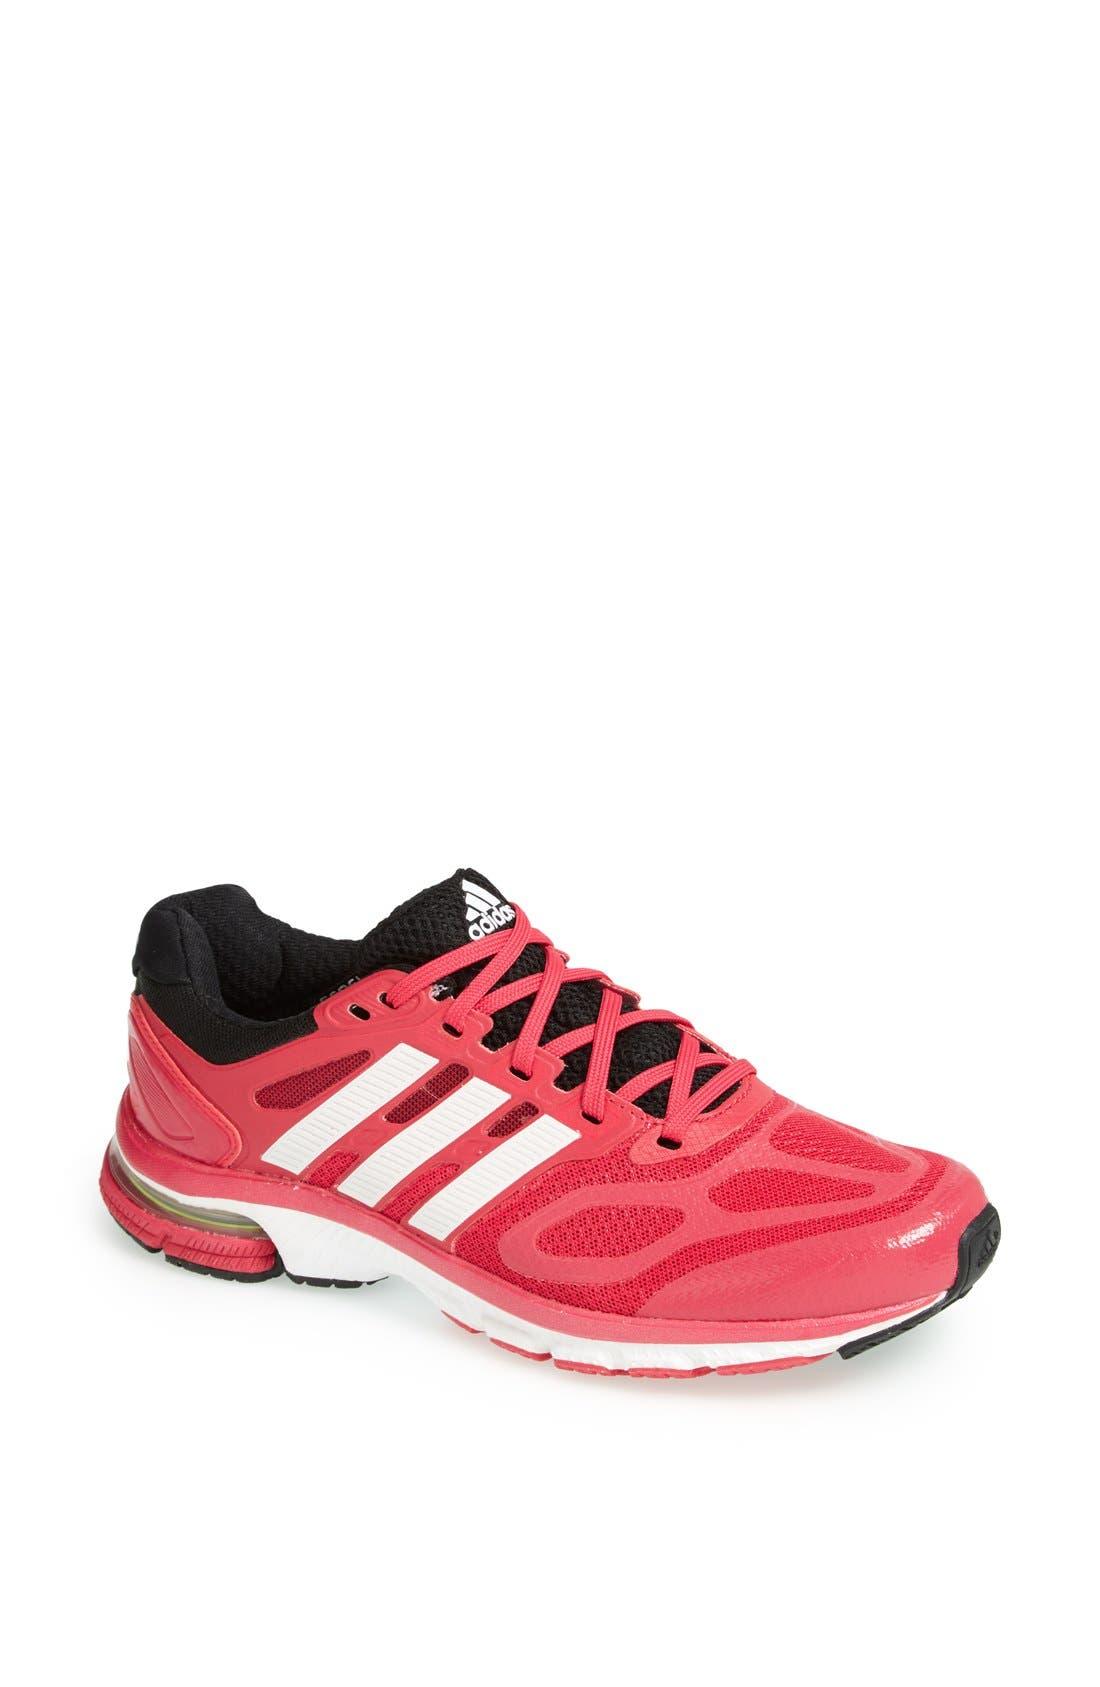 Main Image - adidas 'Supernova Sequence 6' Running Shoe (Women)